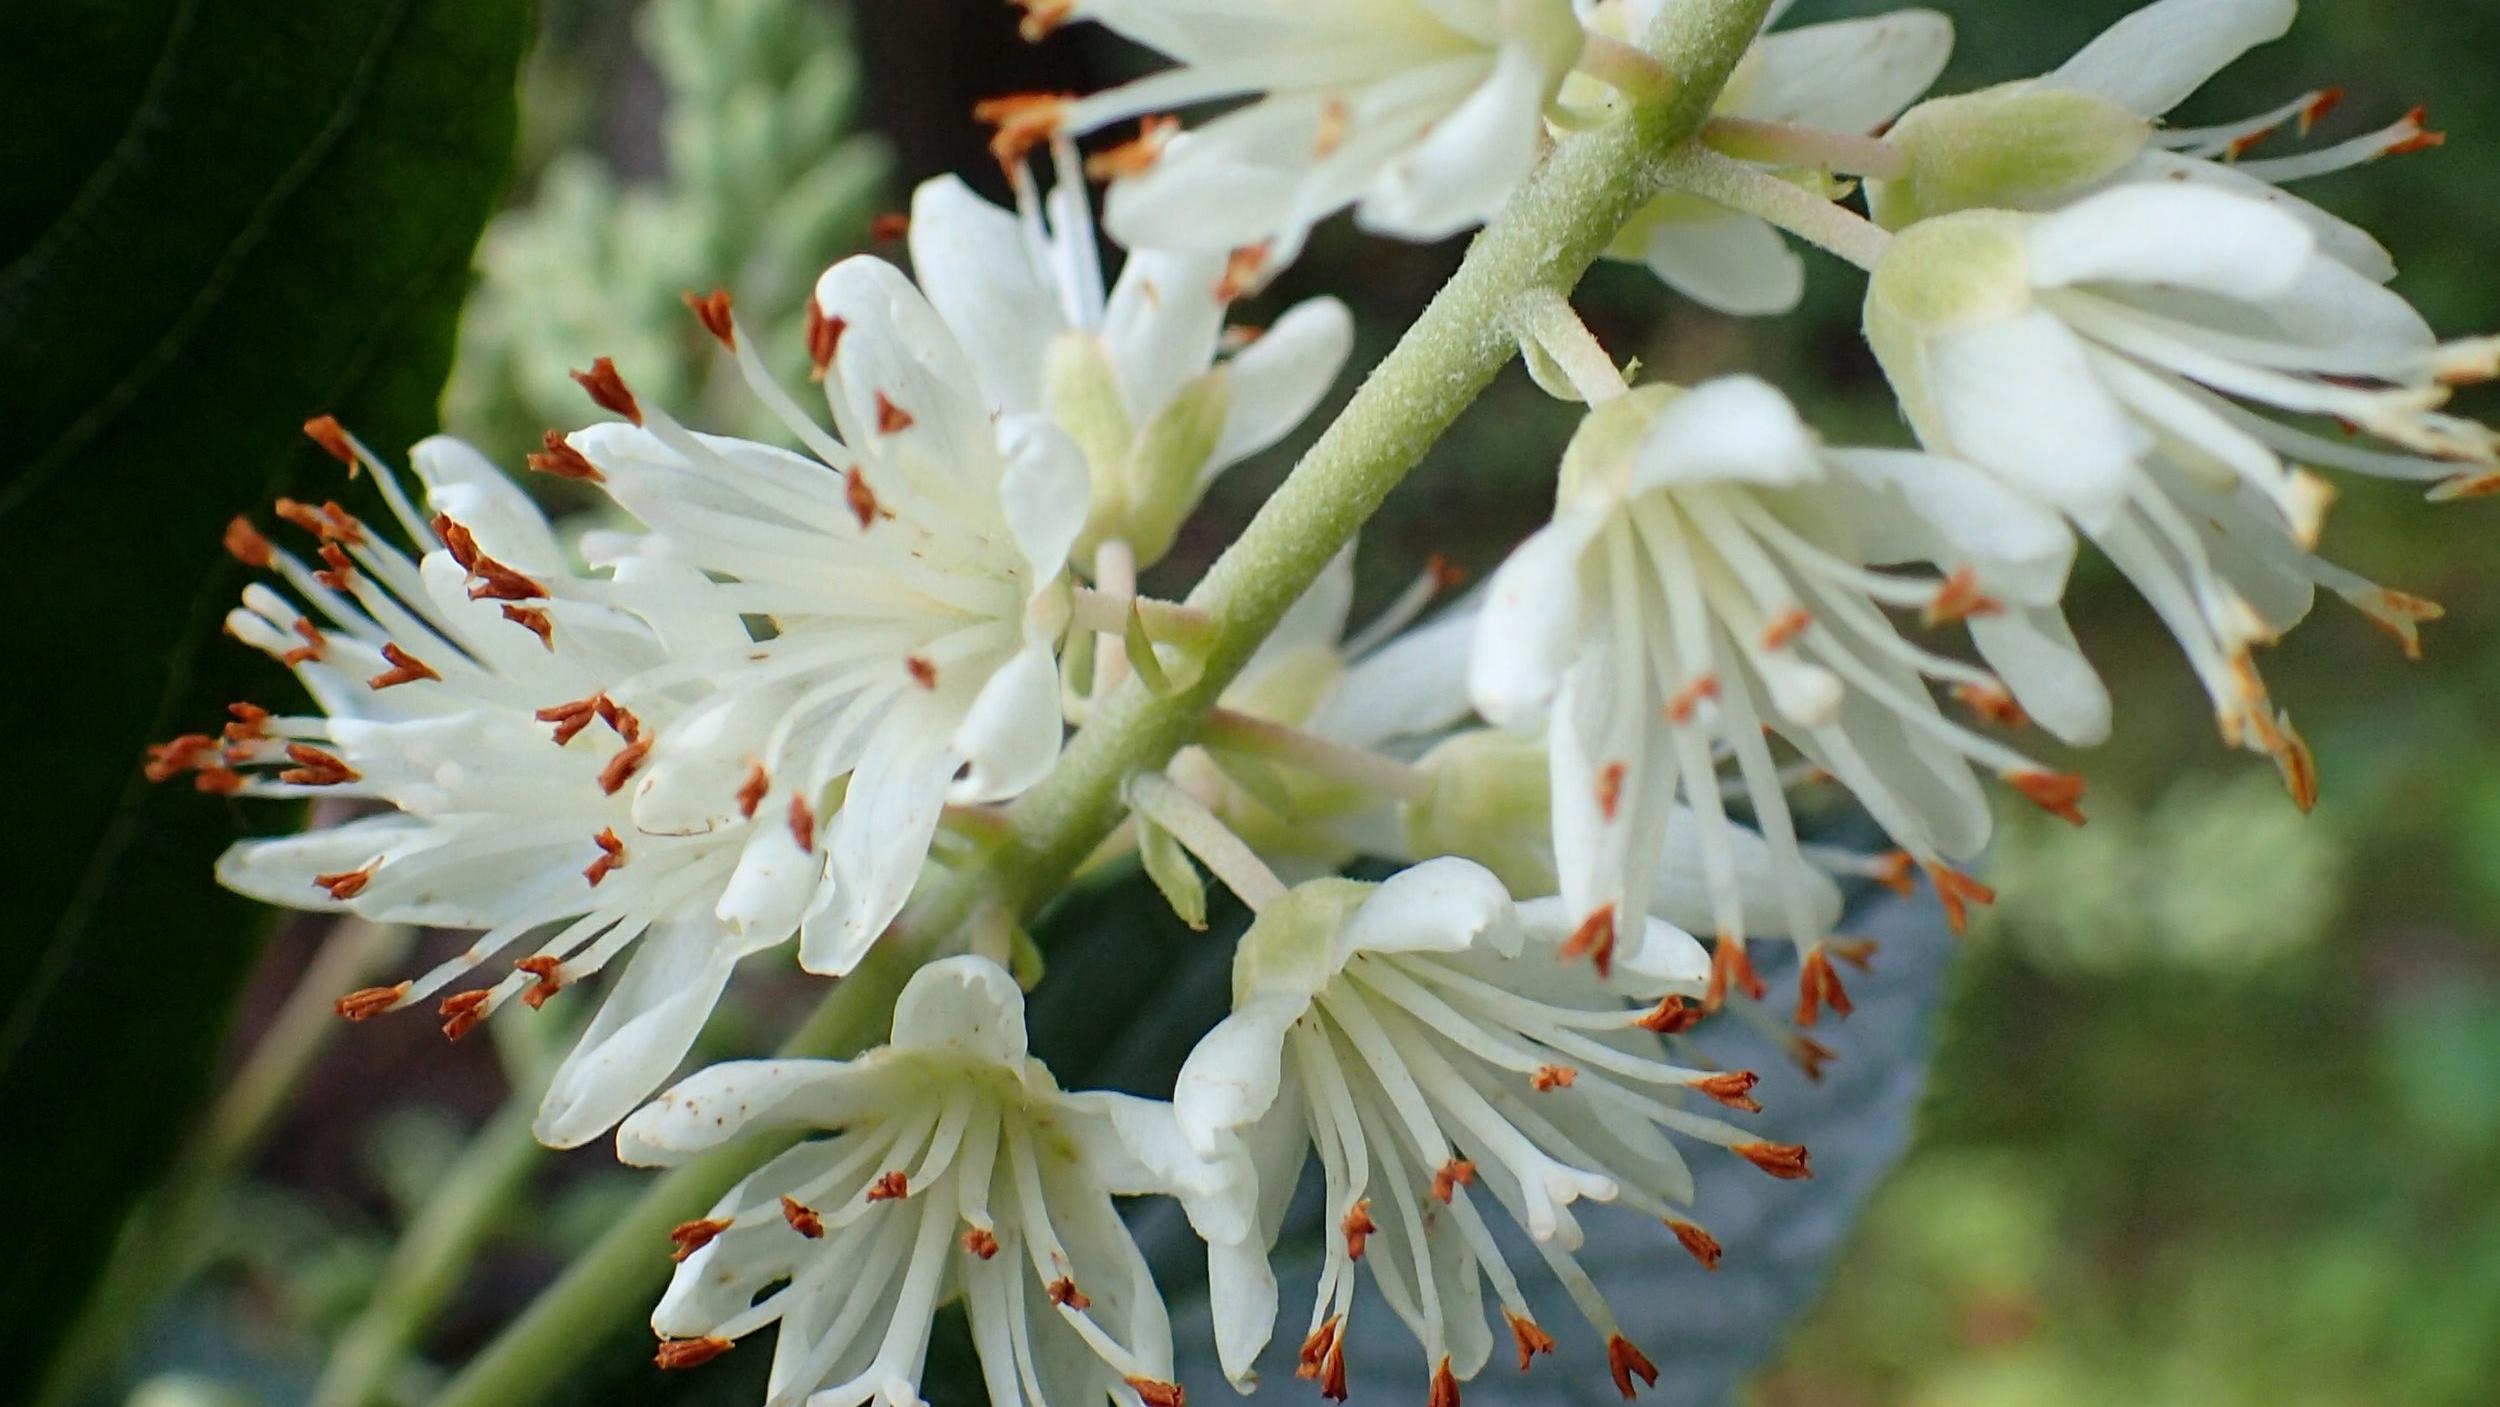 Clethra_alnifolia_Hummingbird_kz3.jpg